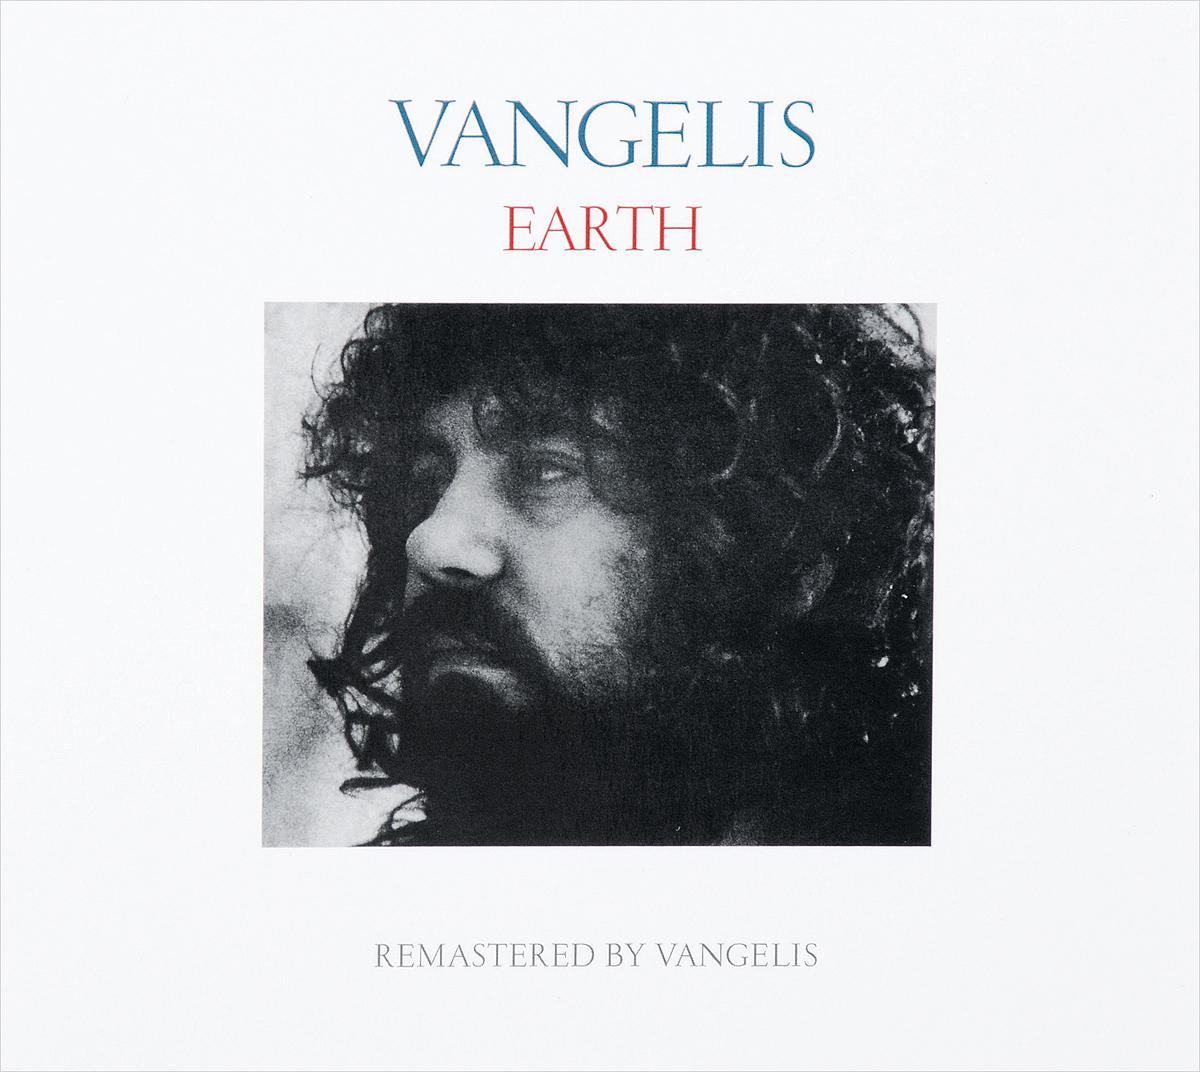 Вангелис Vangelis. Earth вангелис vangelis earth